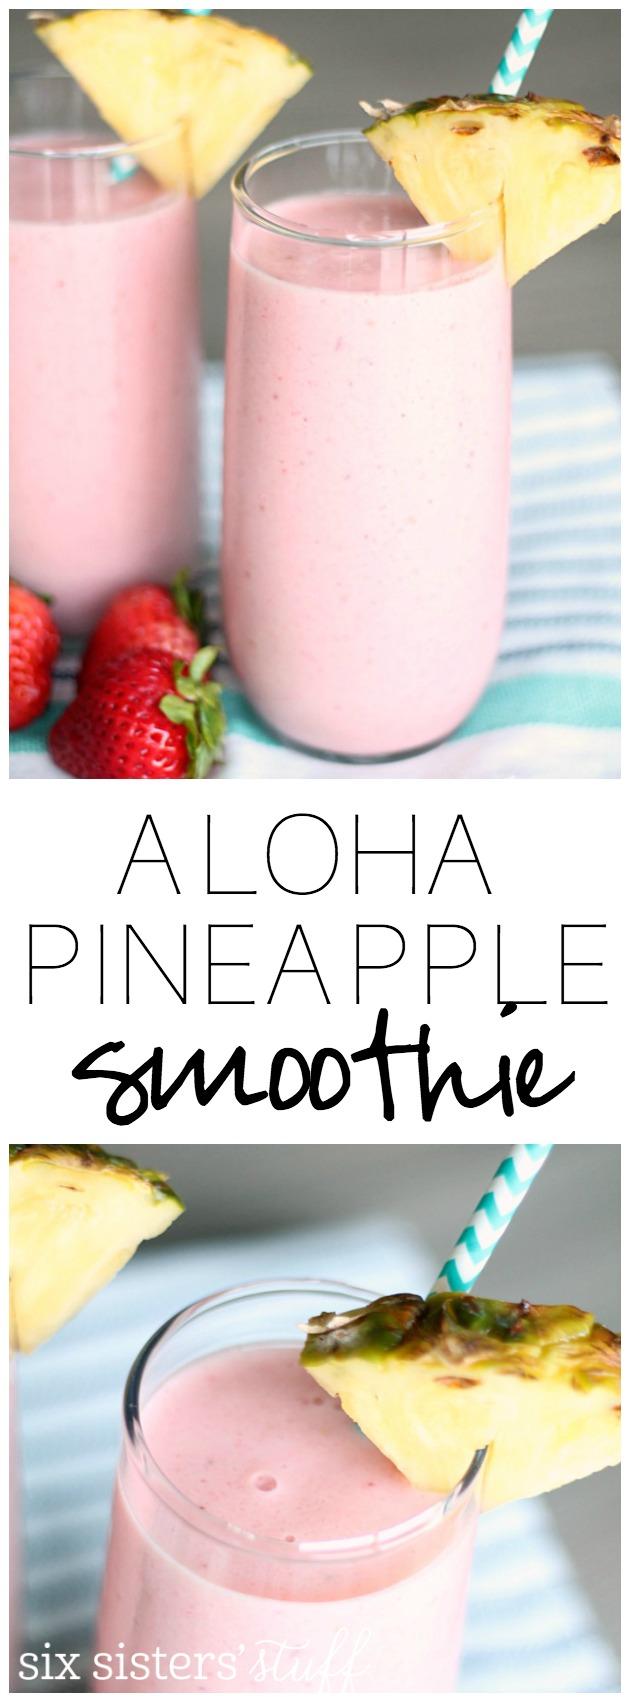 Copycat Jamba Juice Aloha Pineapple Smoothie from SixSistersStuff.com